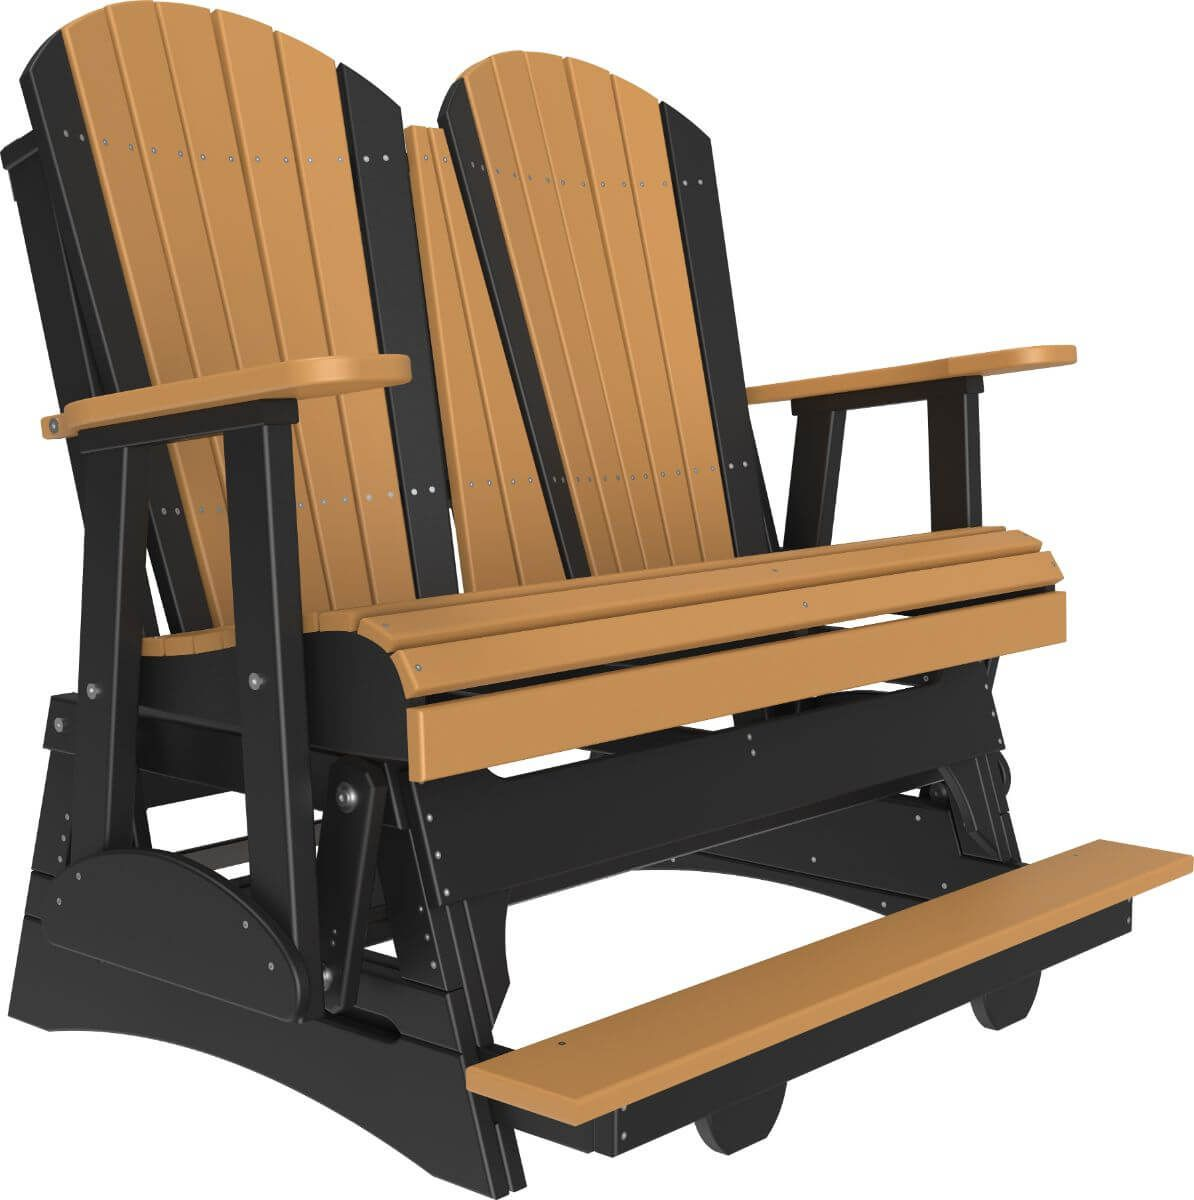 Cedar and Black Tahiti Loveseat Balcony Glider